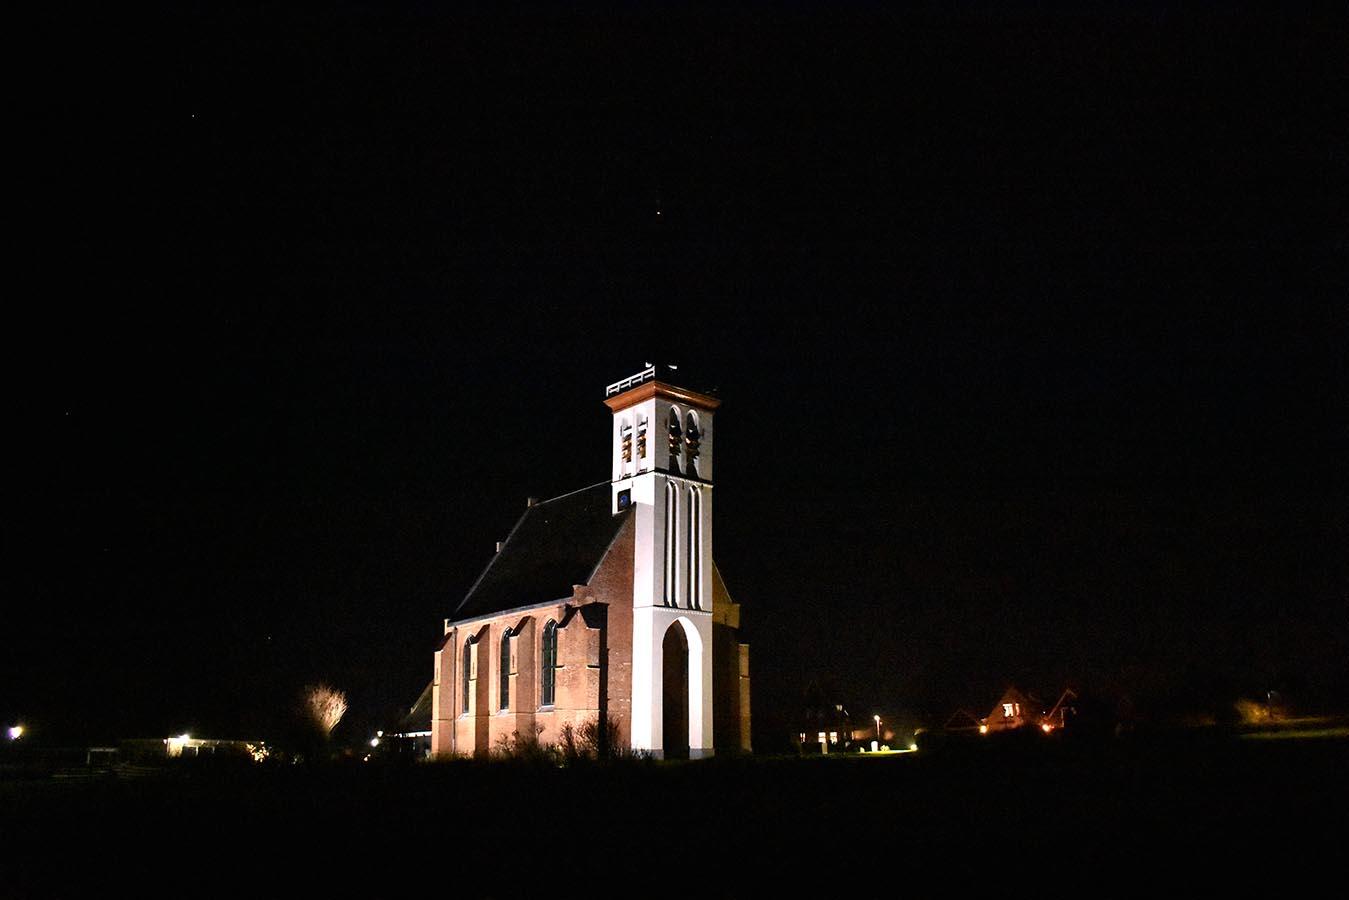 Kerkje in Den Hoorn mooi verlicht in de avond brengt licht in de duisternis - Foto: © Louis Fraanje